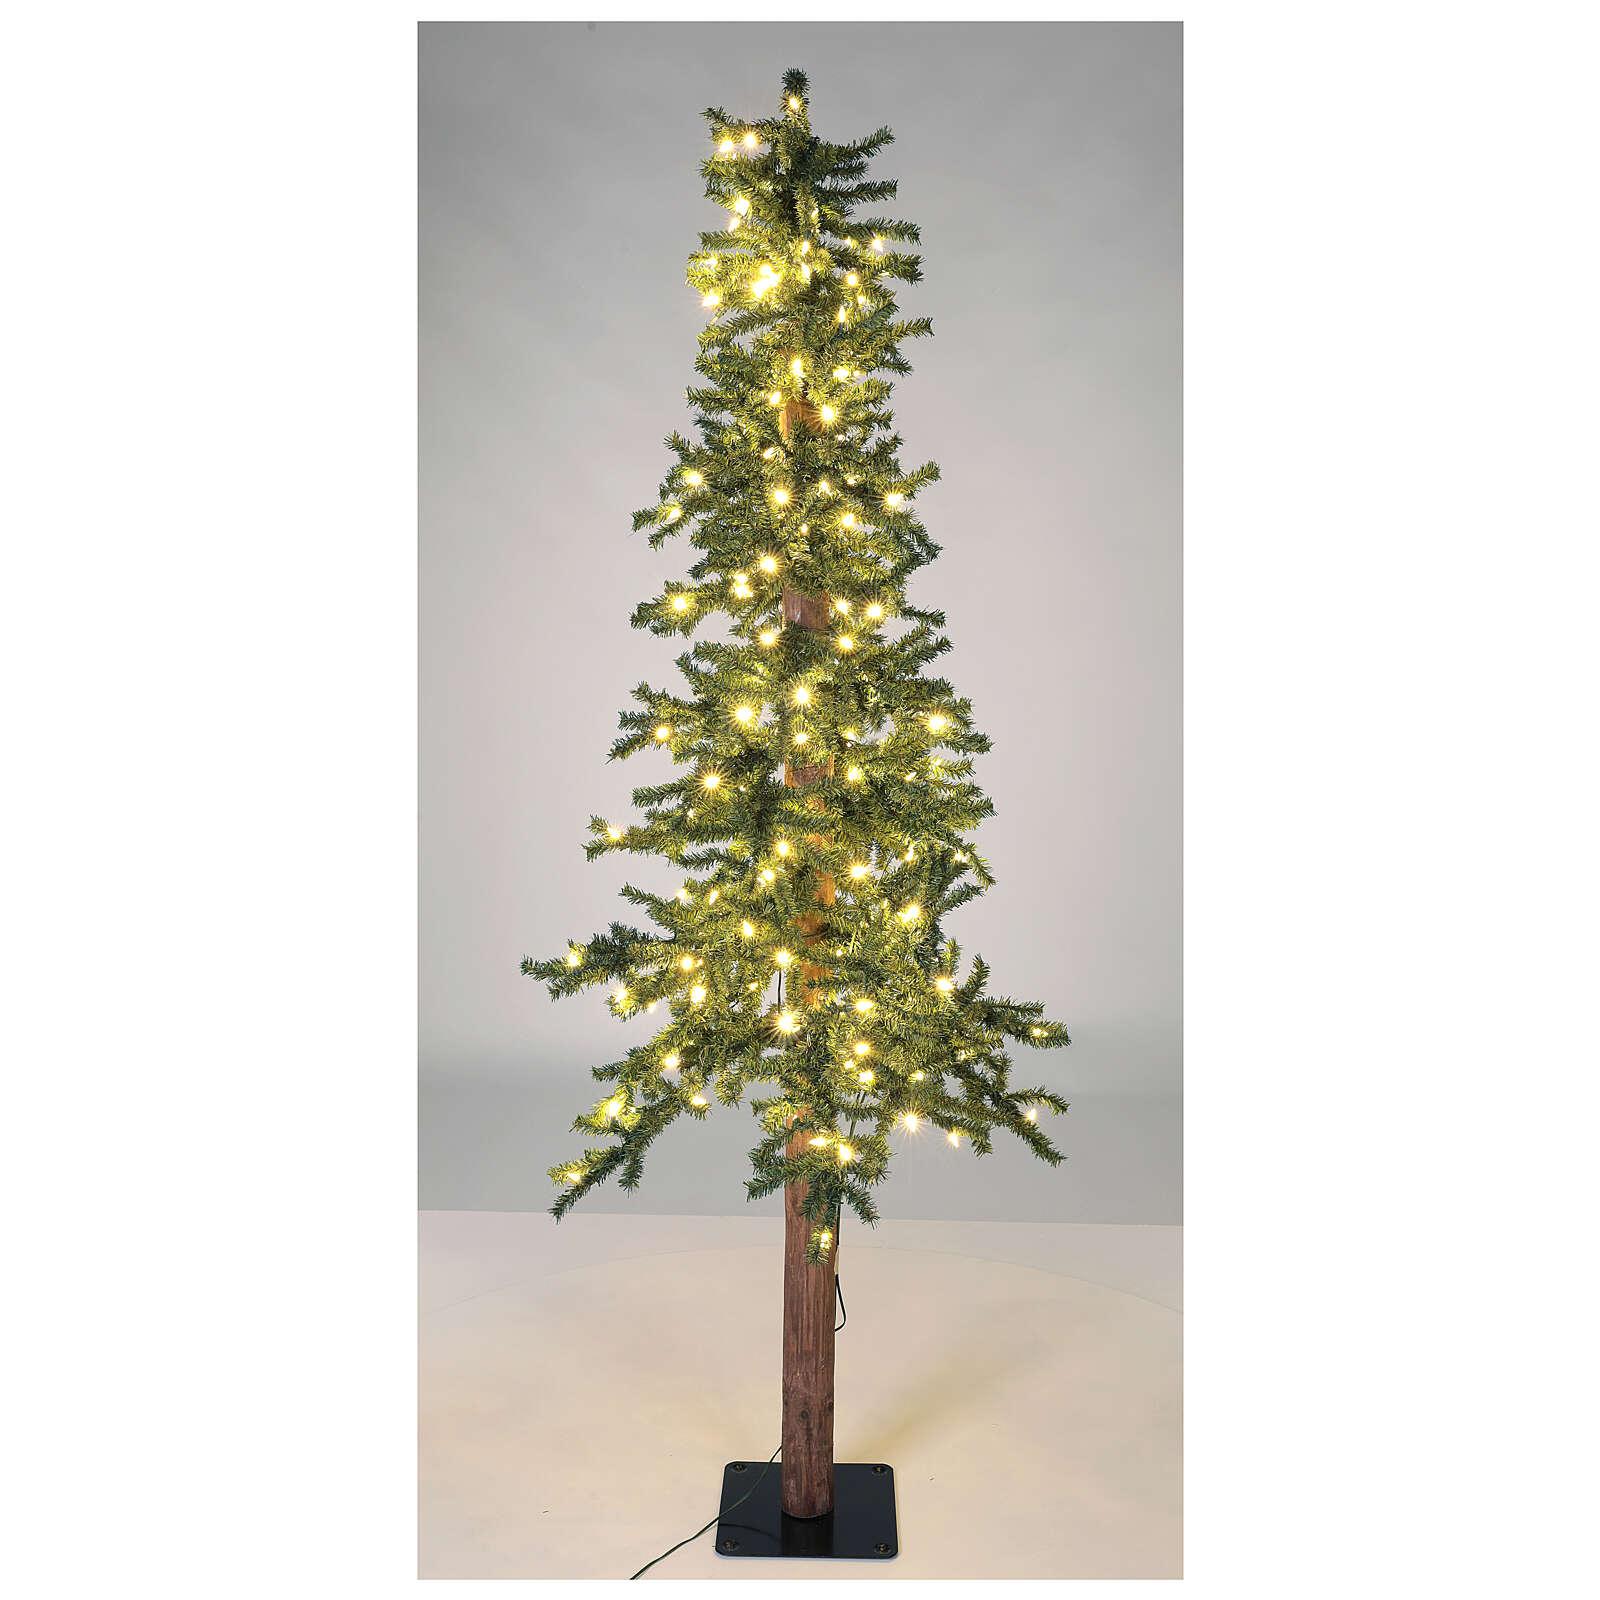 STOCK Albero Natale 210 cm abete Slim Forest 300 luci led caldi esterno 3